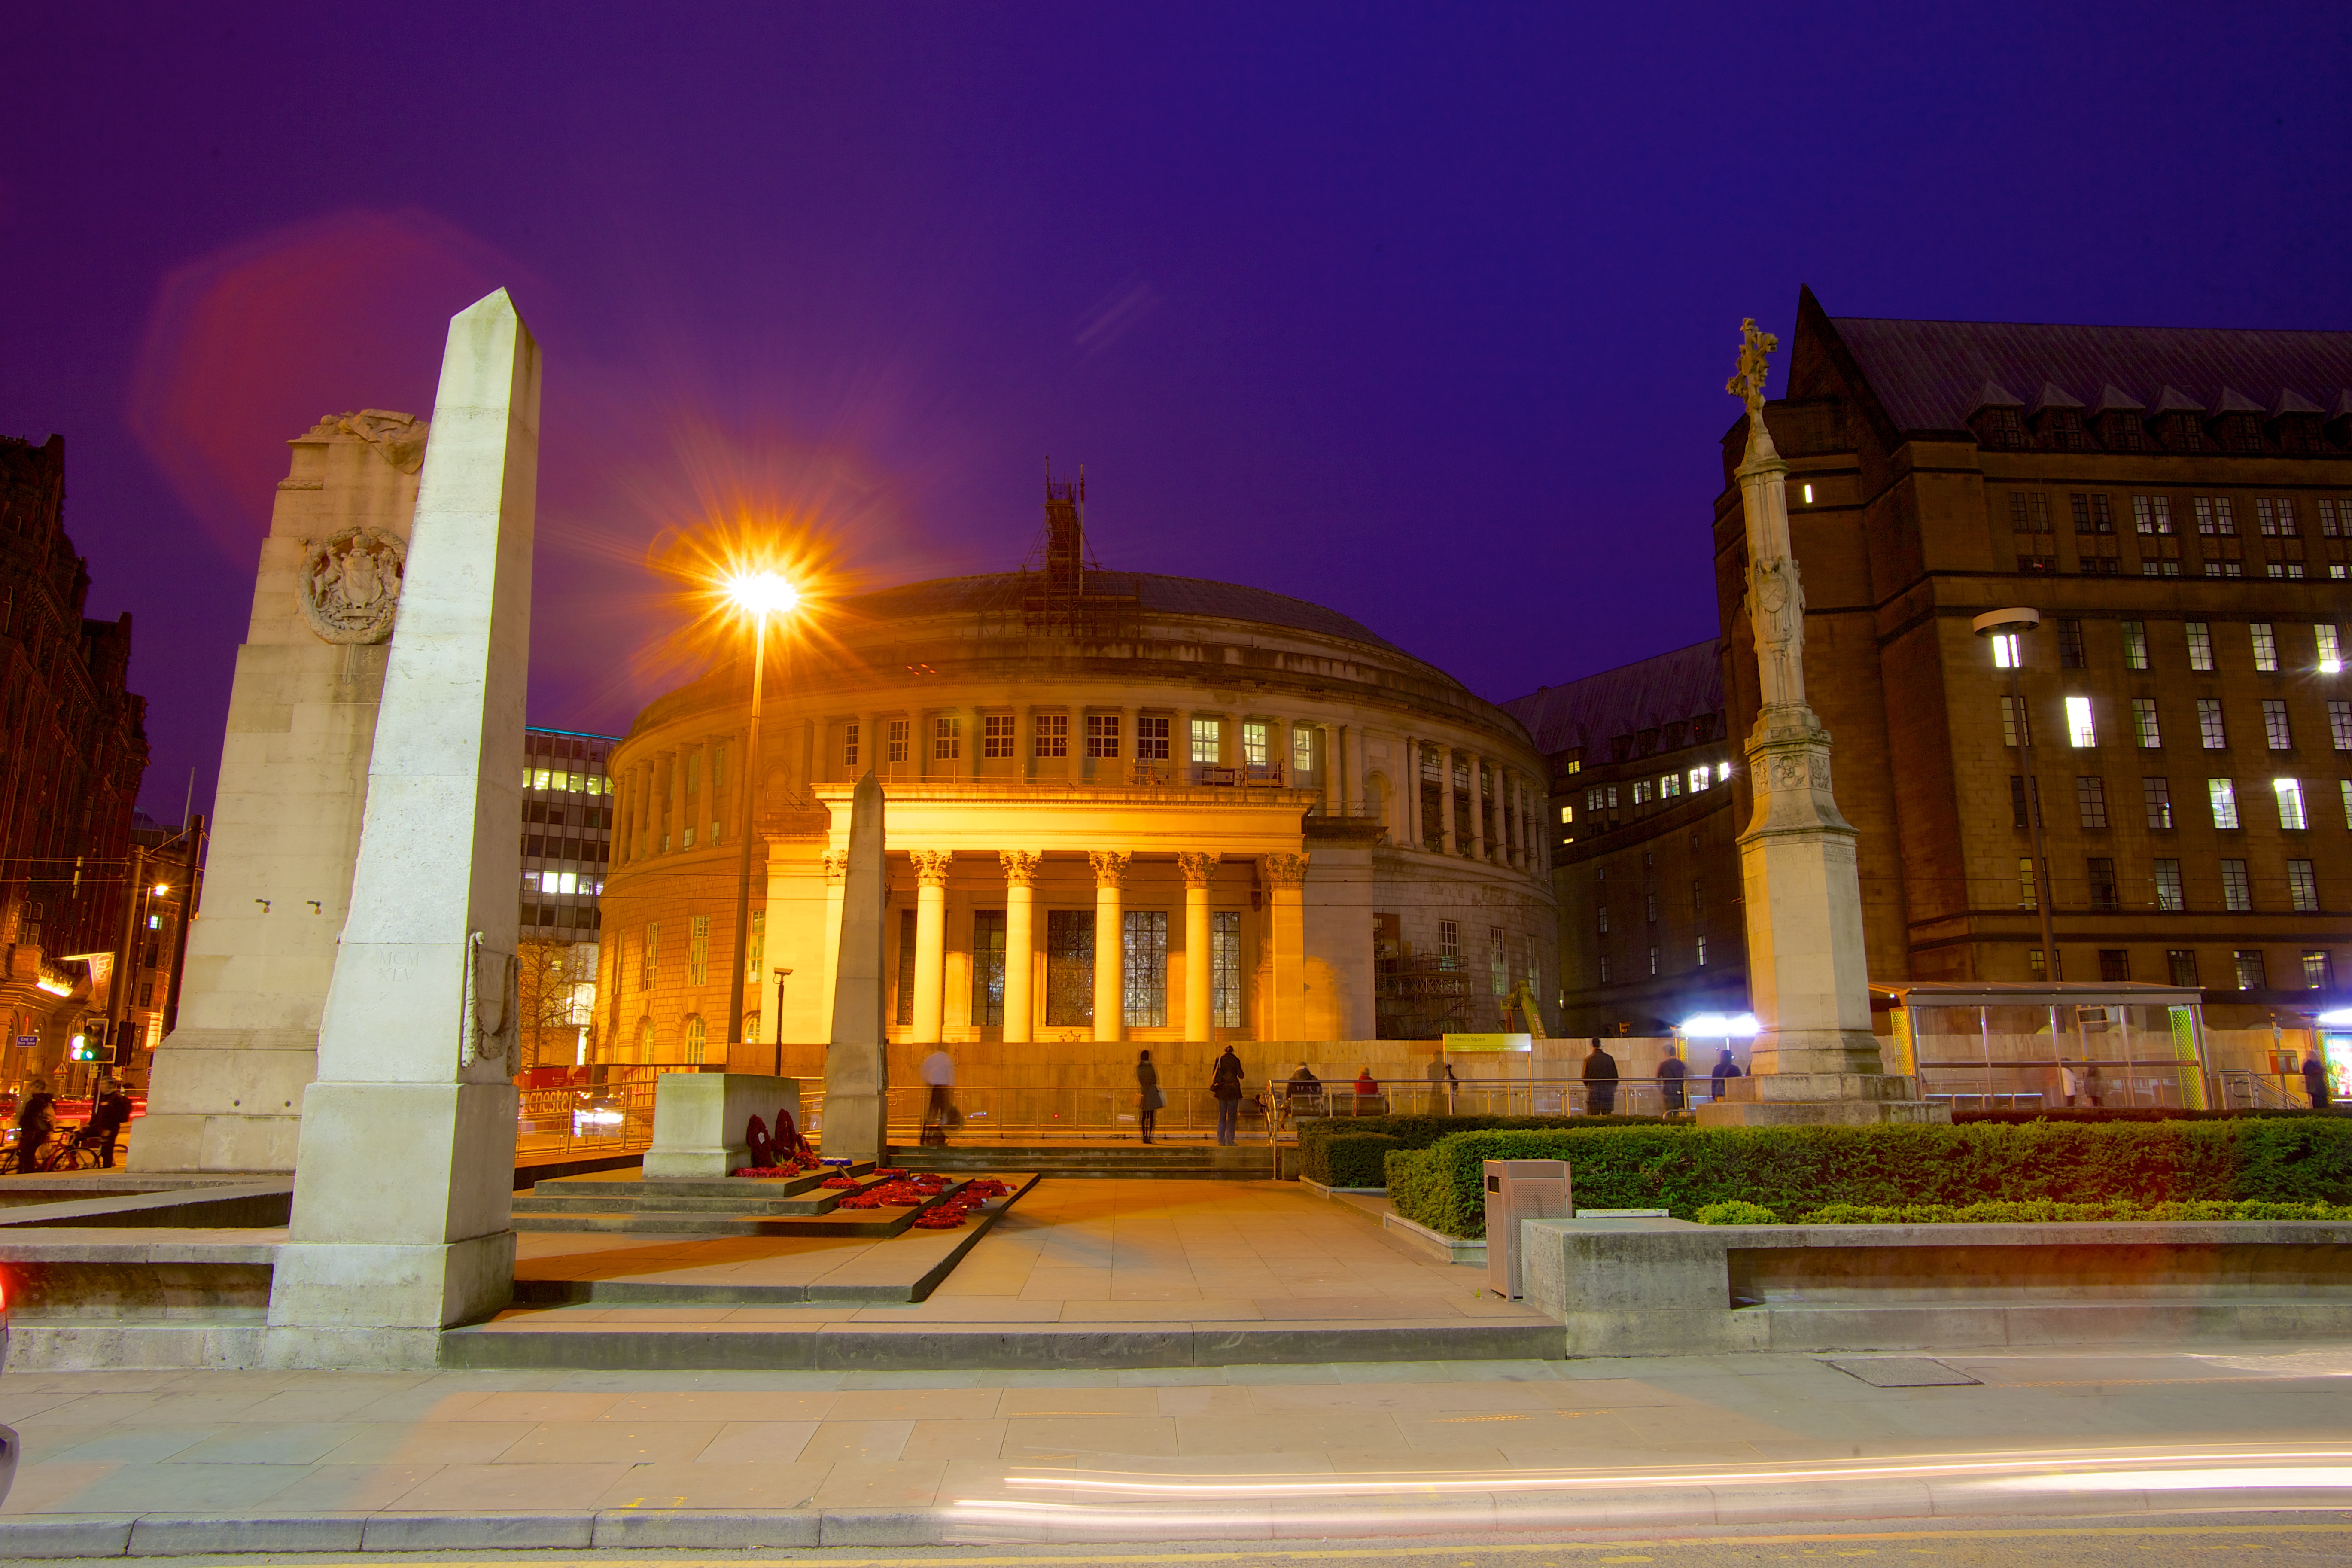 Imagebox_-_Manchester_St_Peters_Square-7.jpg?1549532947